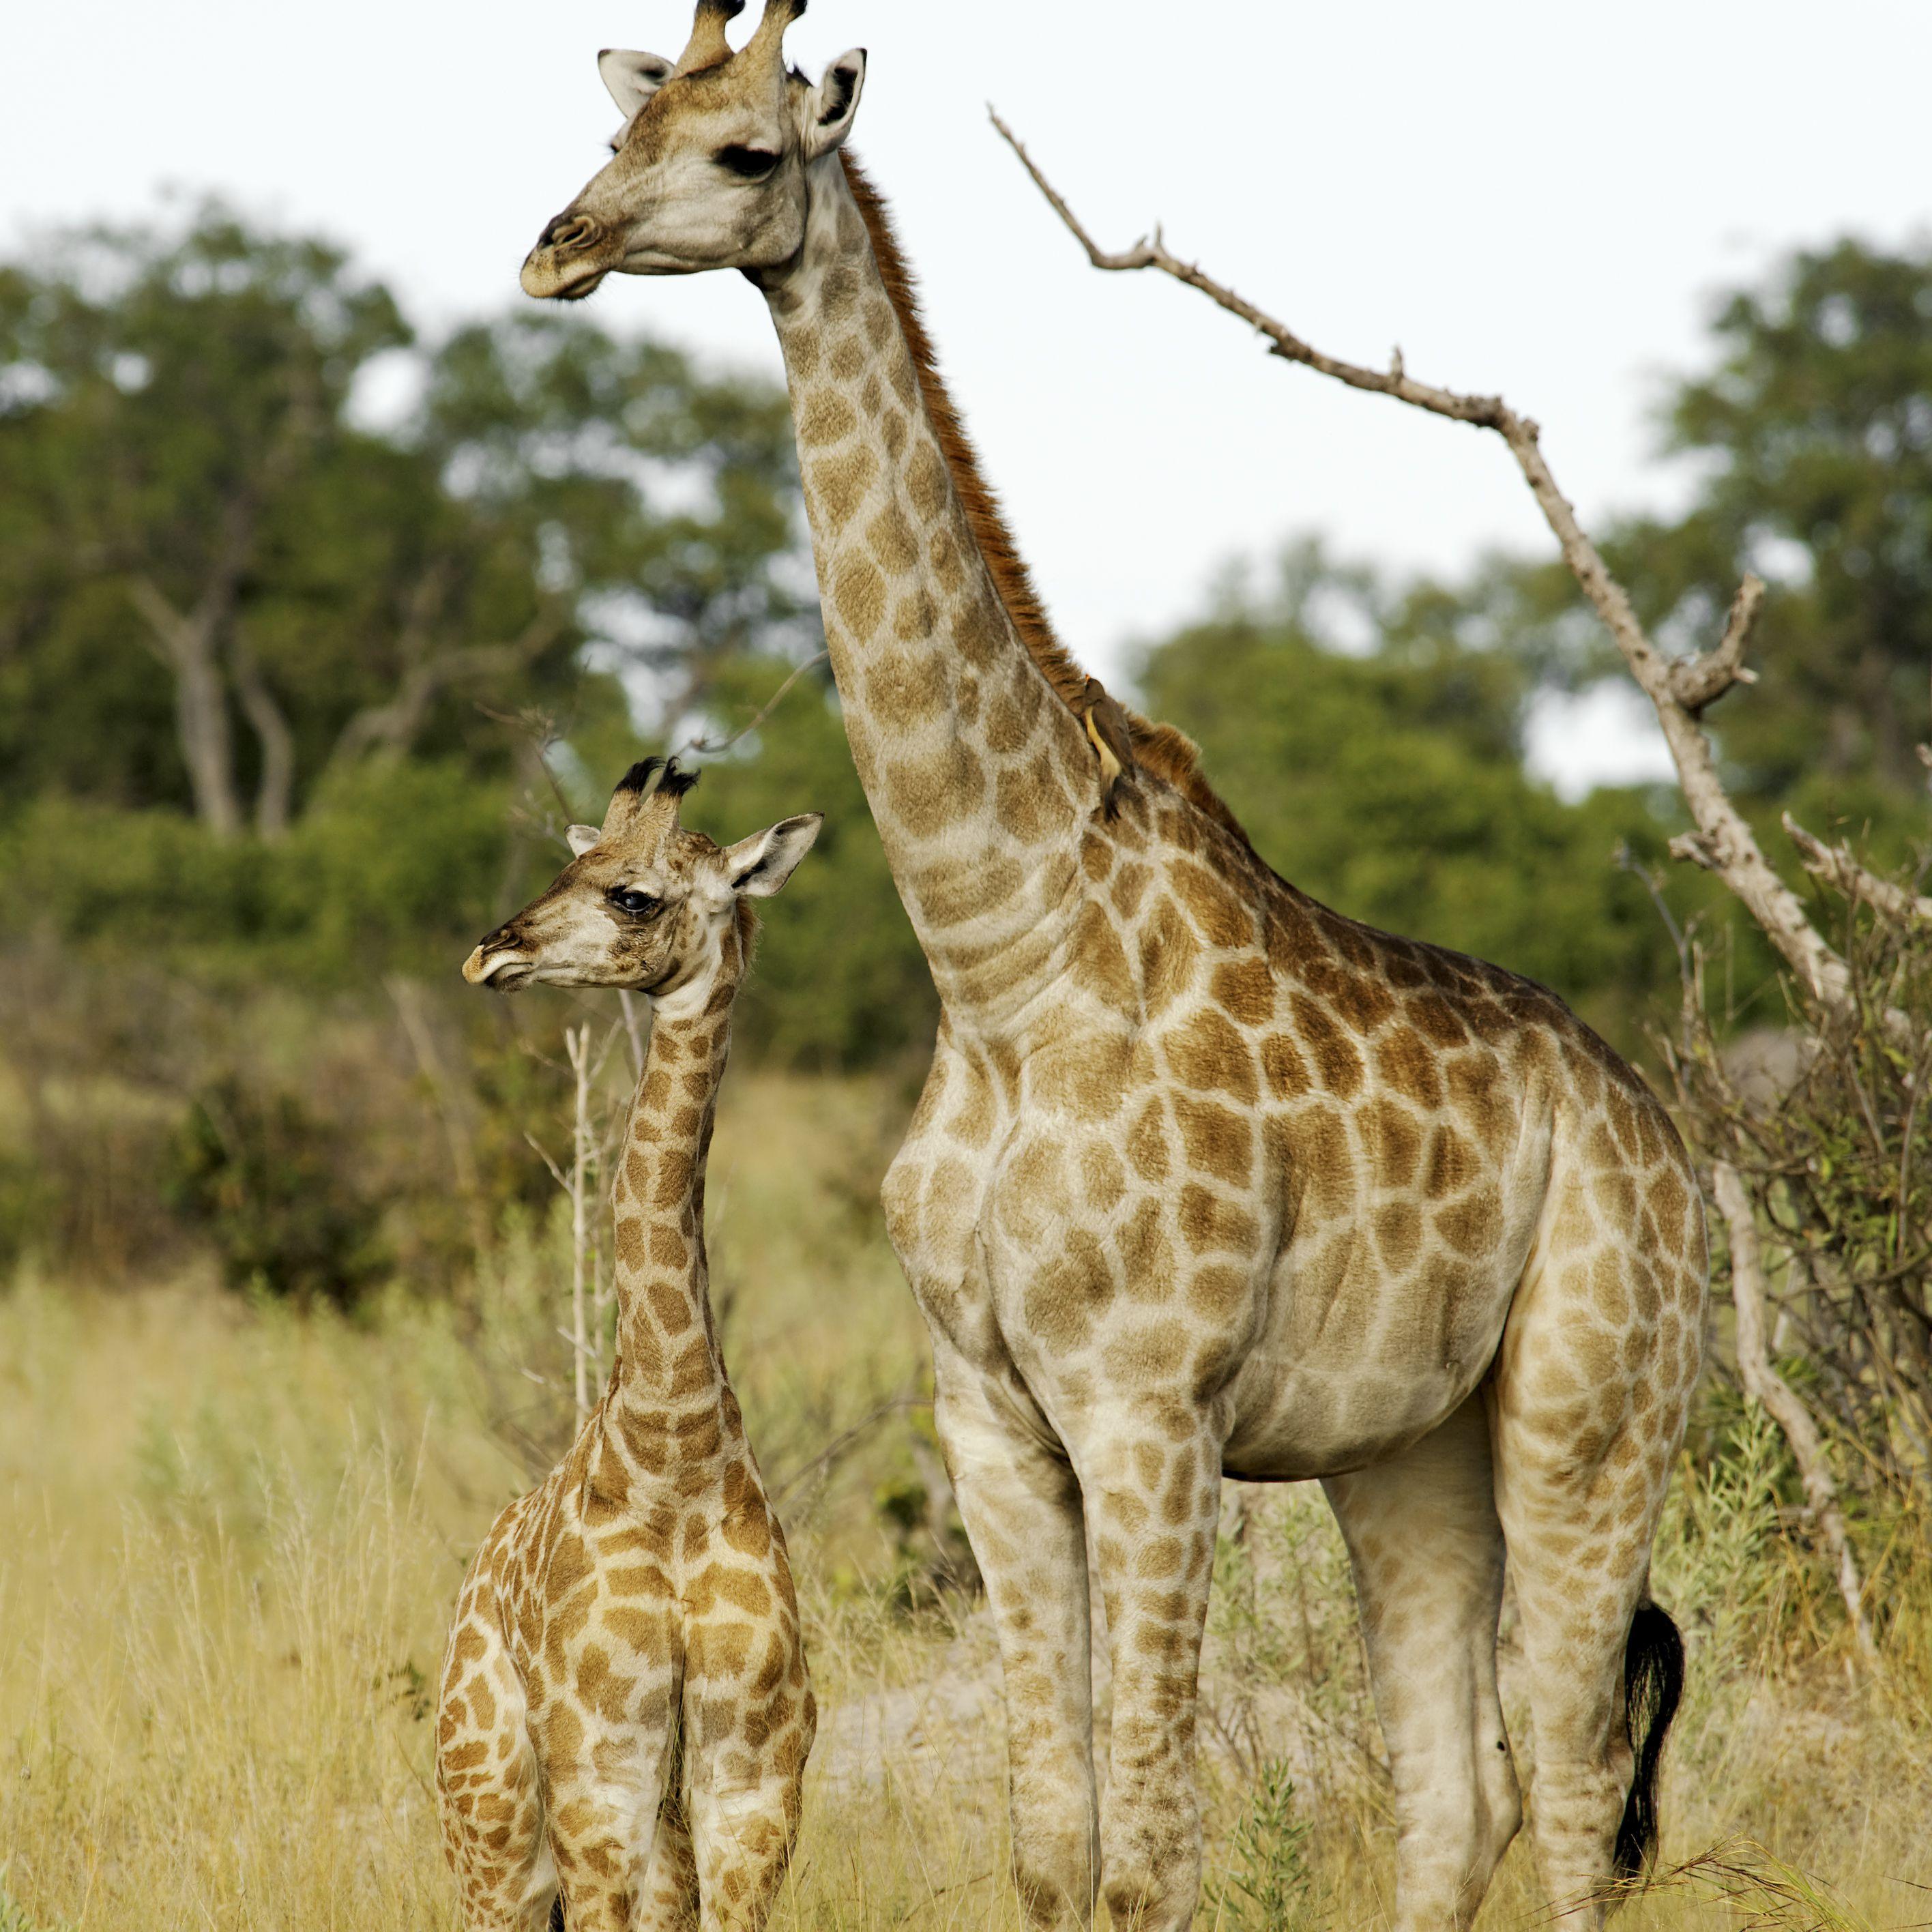 Giraffe mother and her calf, Okavango Delta, Botswana